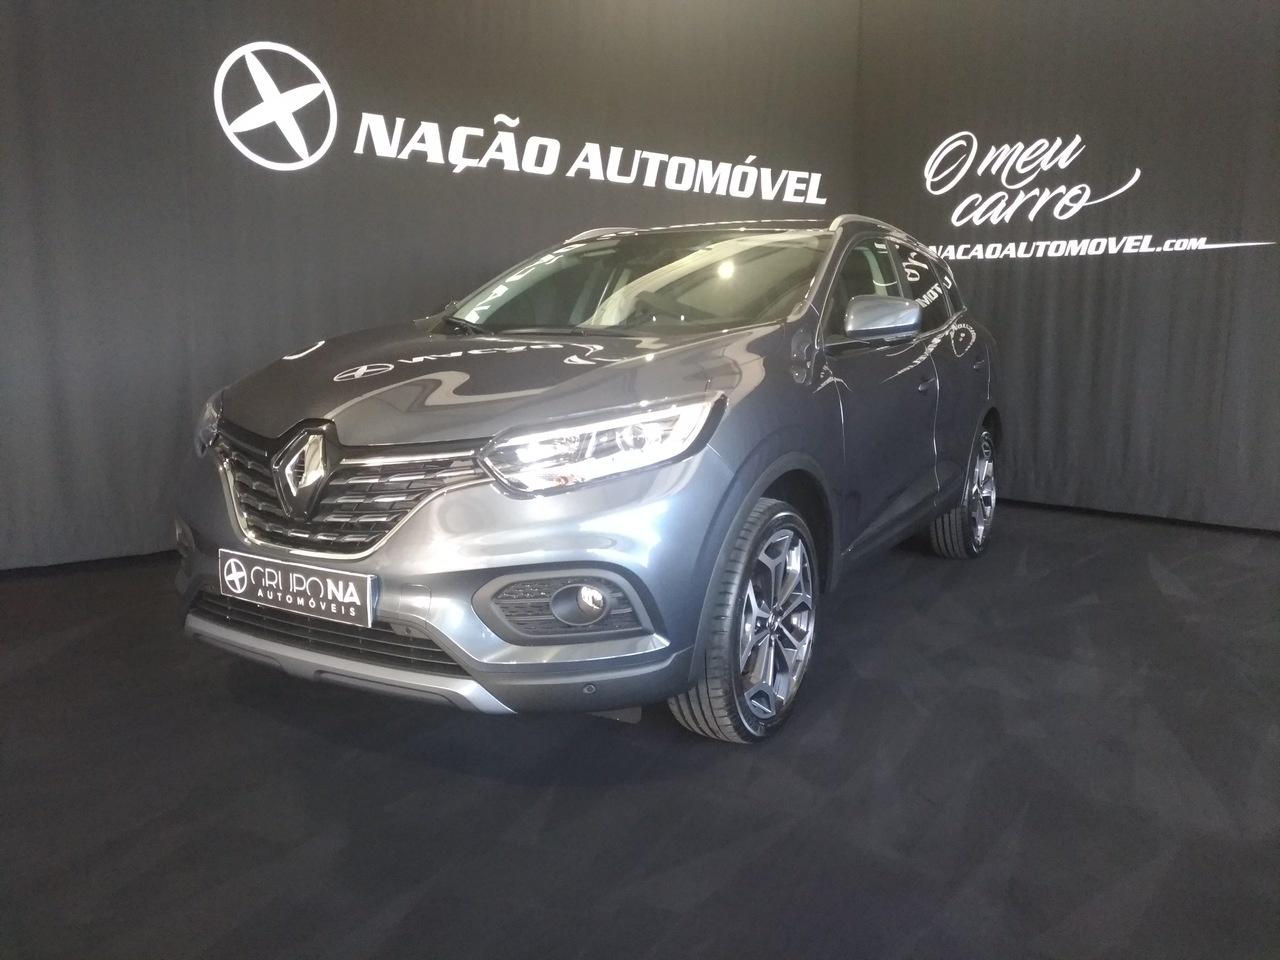 Renault Kadjar 1.3 Tce 140 FAP 6 velocidades Intens Plus 5 lugares 5 portas